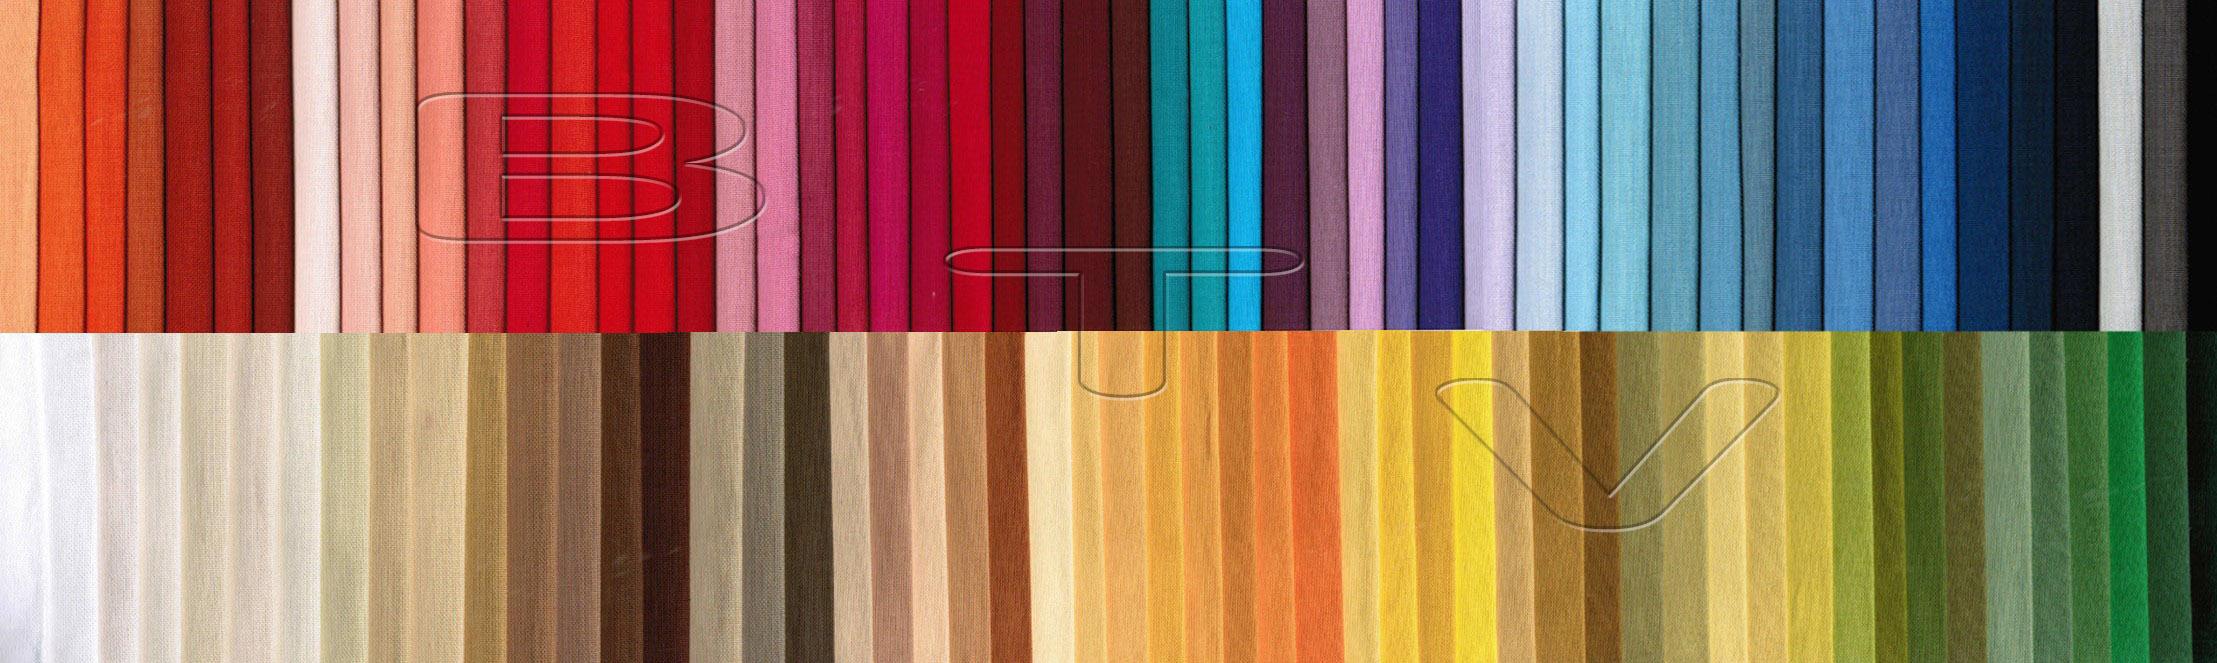 Colorido panama 220 g